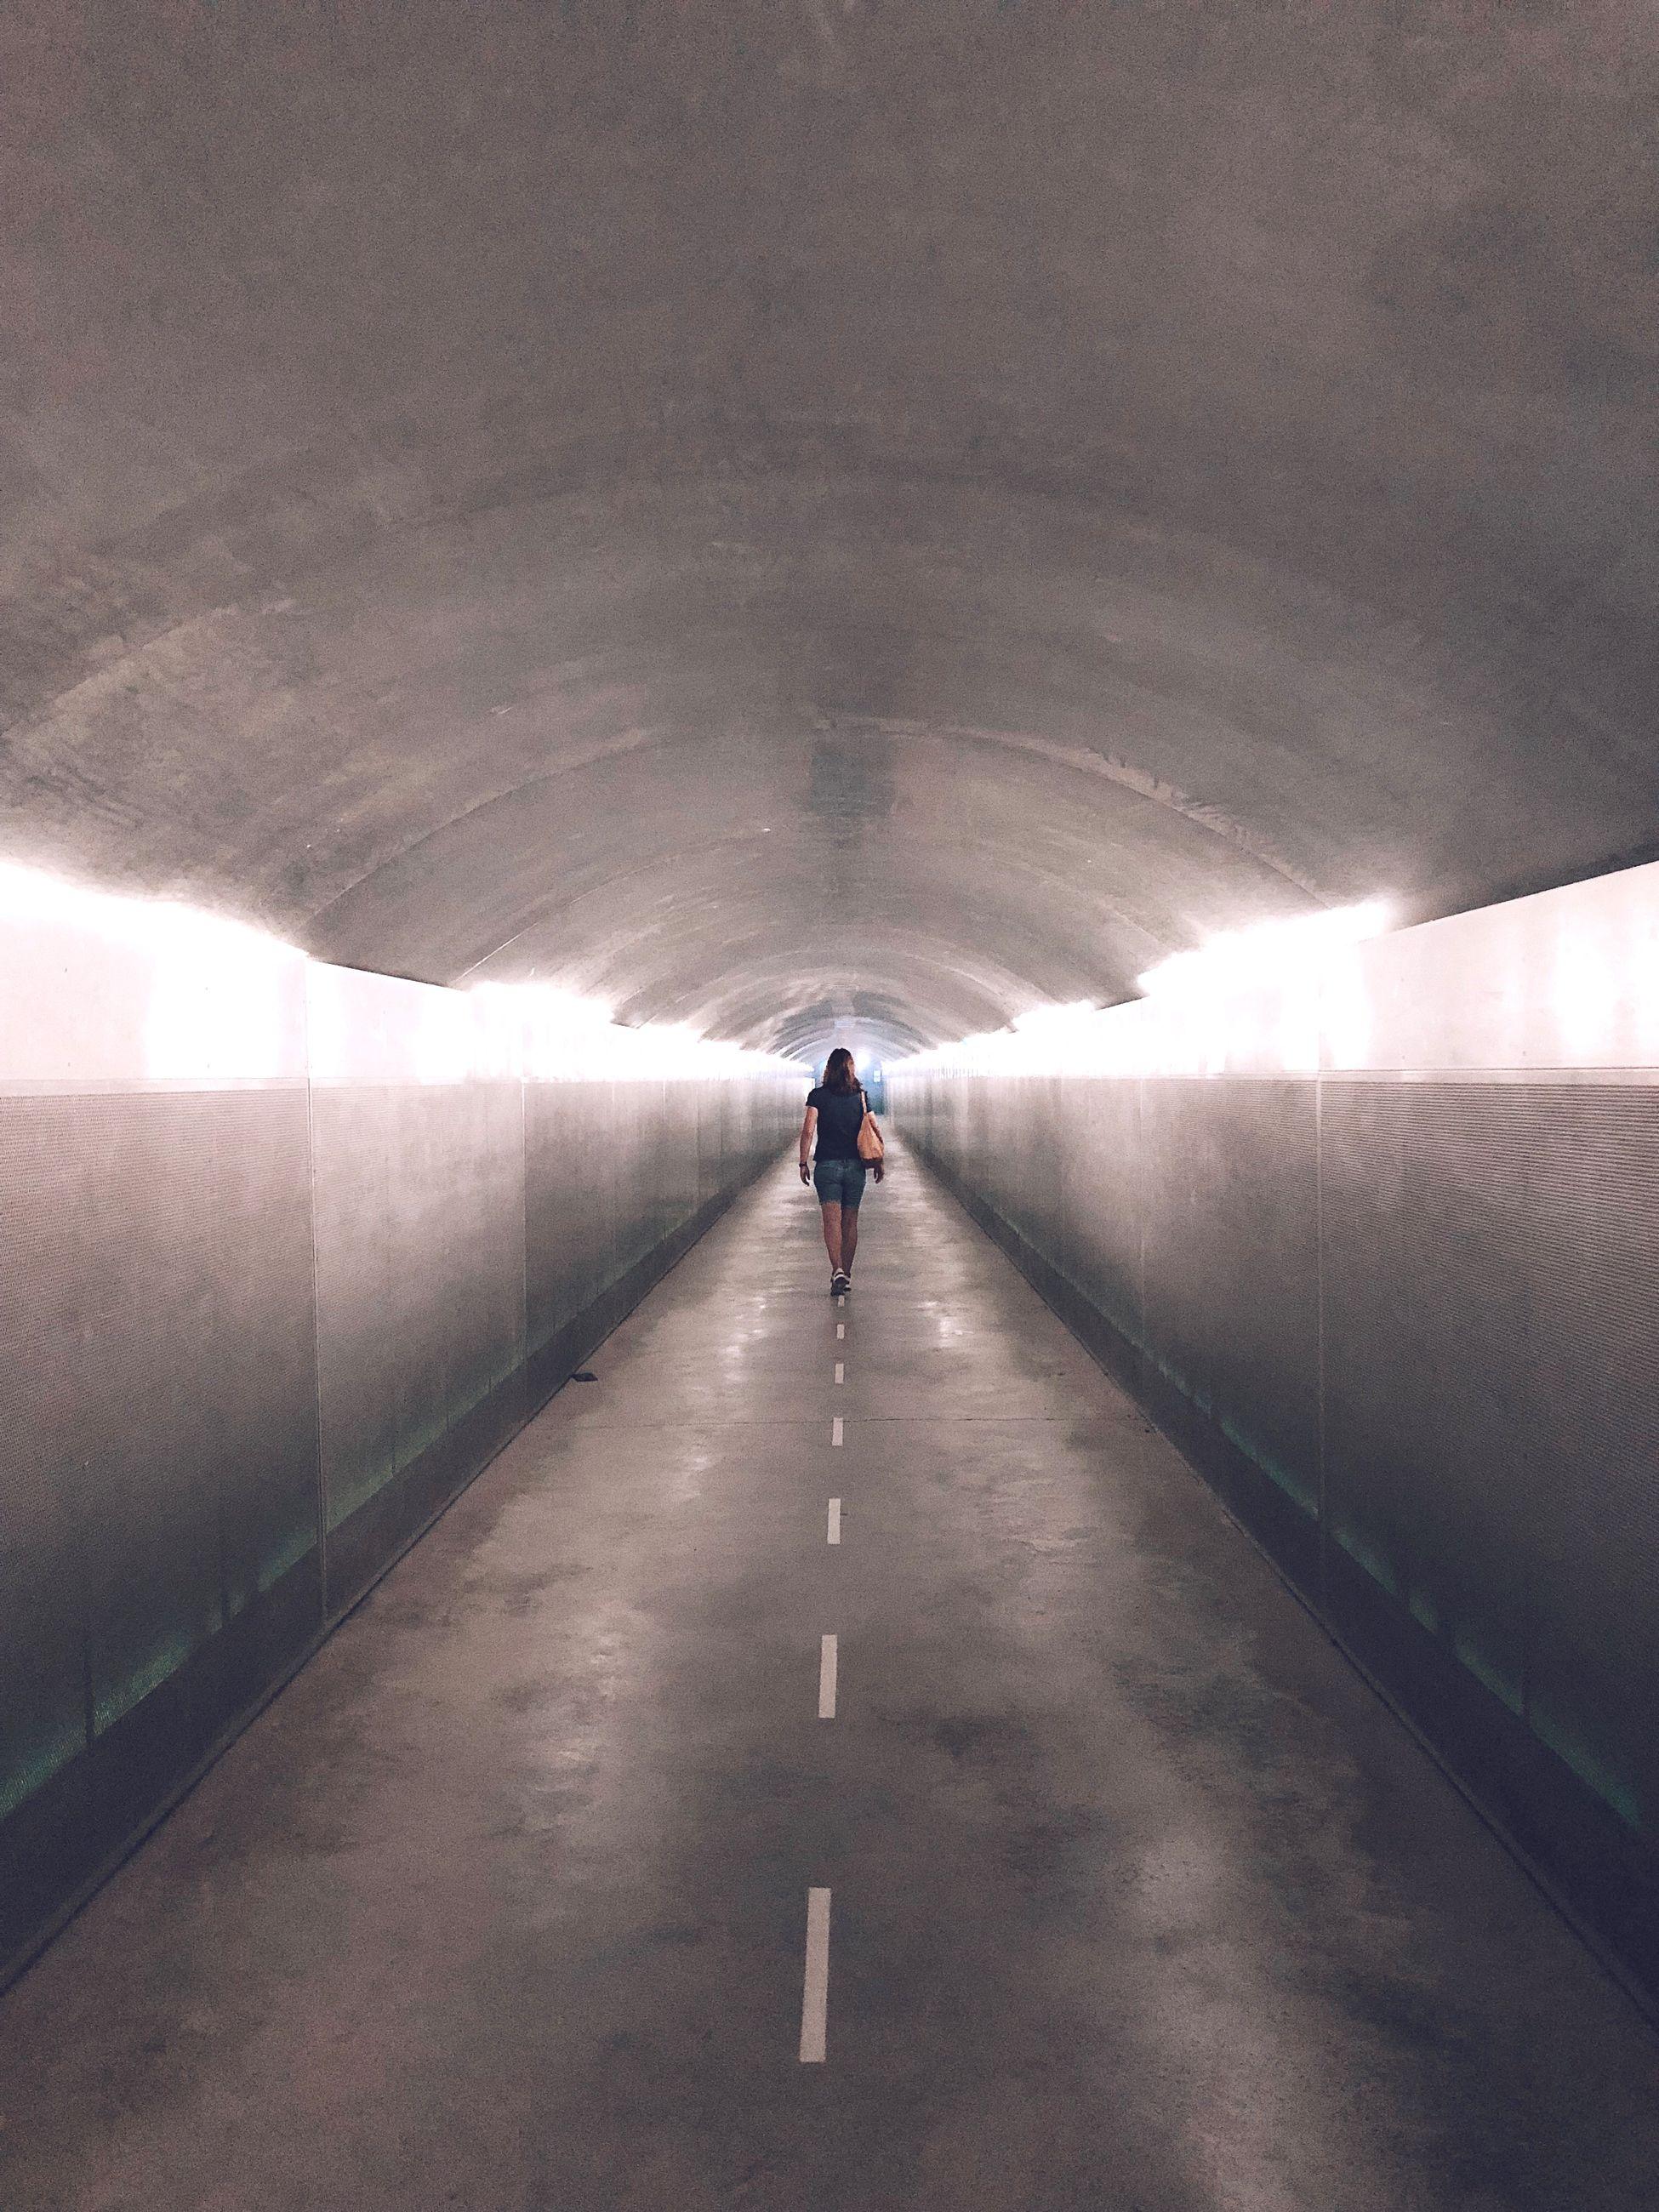 FULL LENGTH REAR VIEW OF MAN WALKING IN TUNNEL